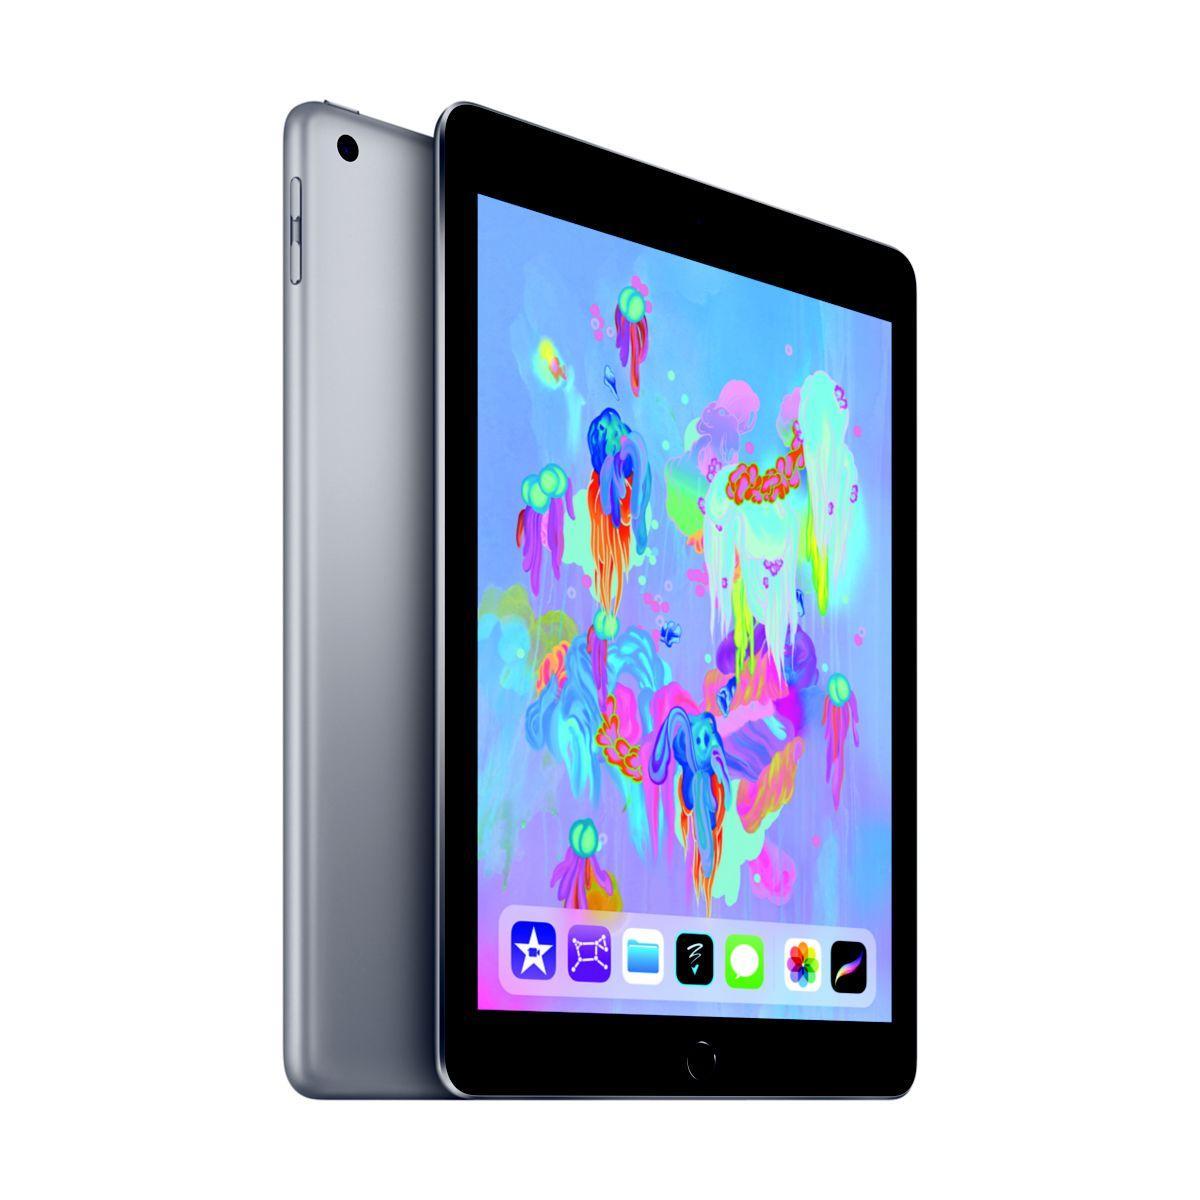 Tablette apple ipad new 32go cell gris sid (photo)